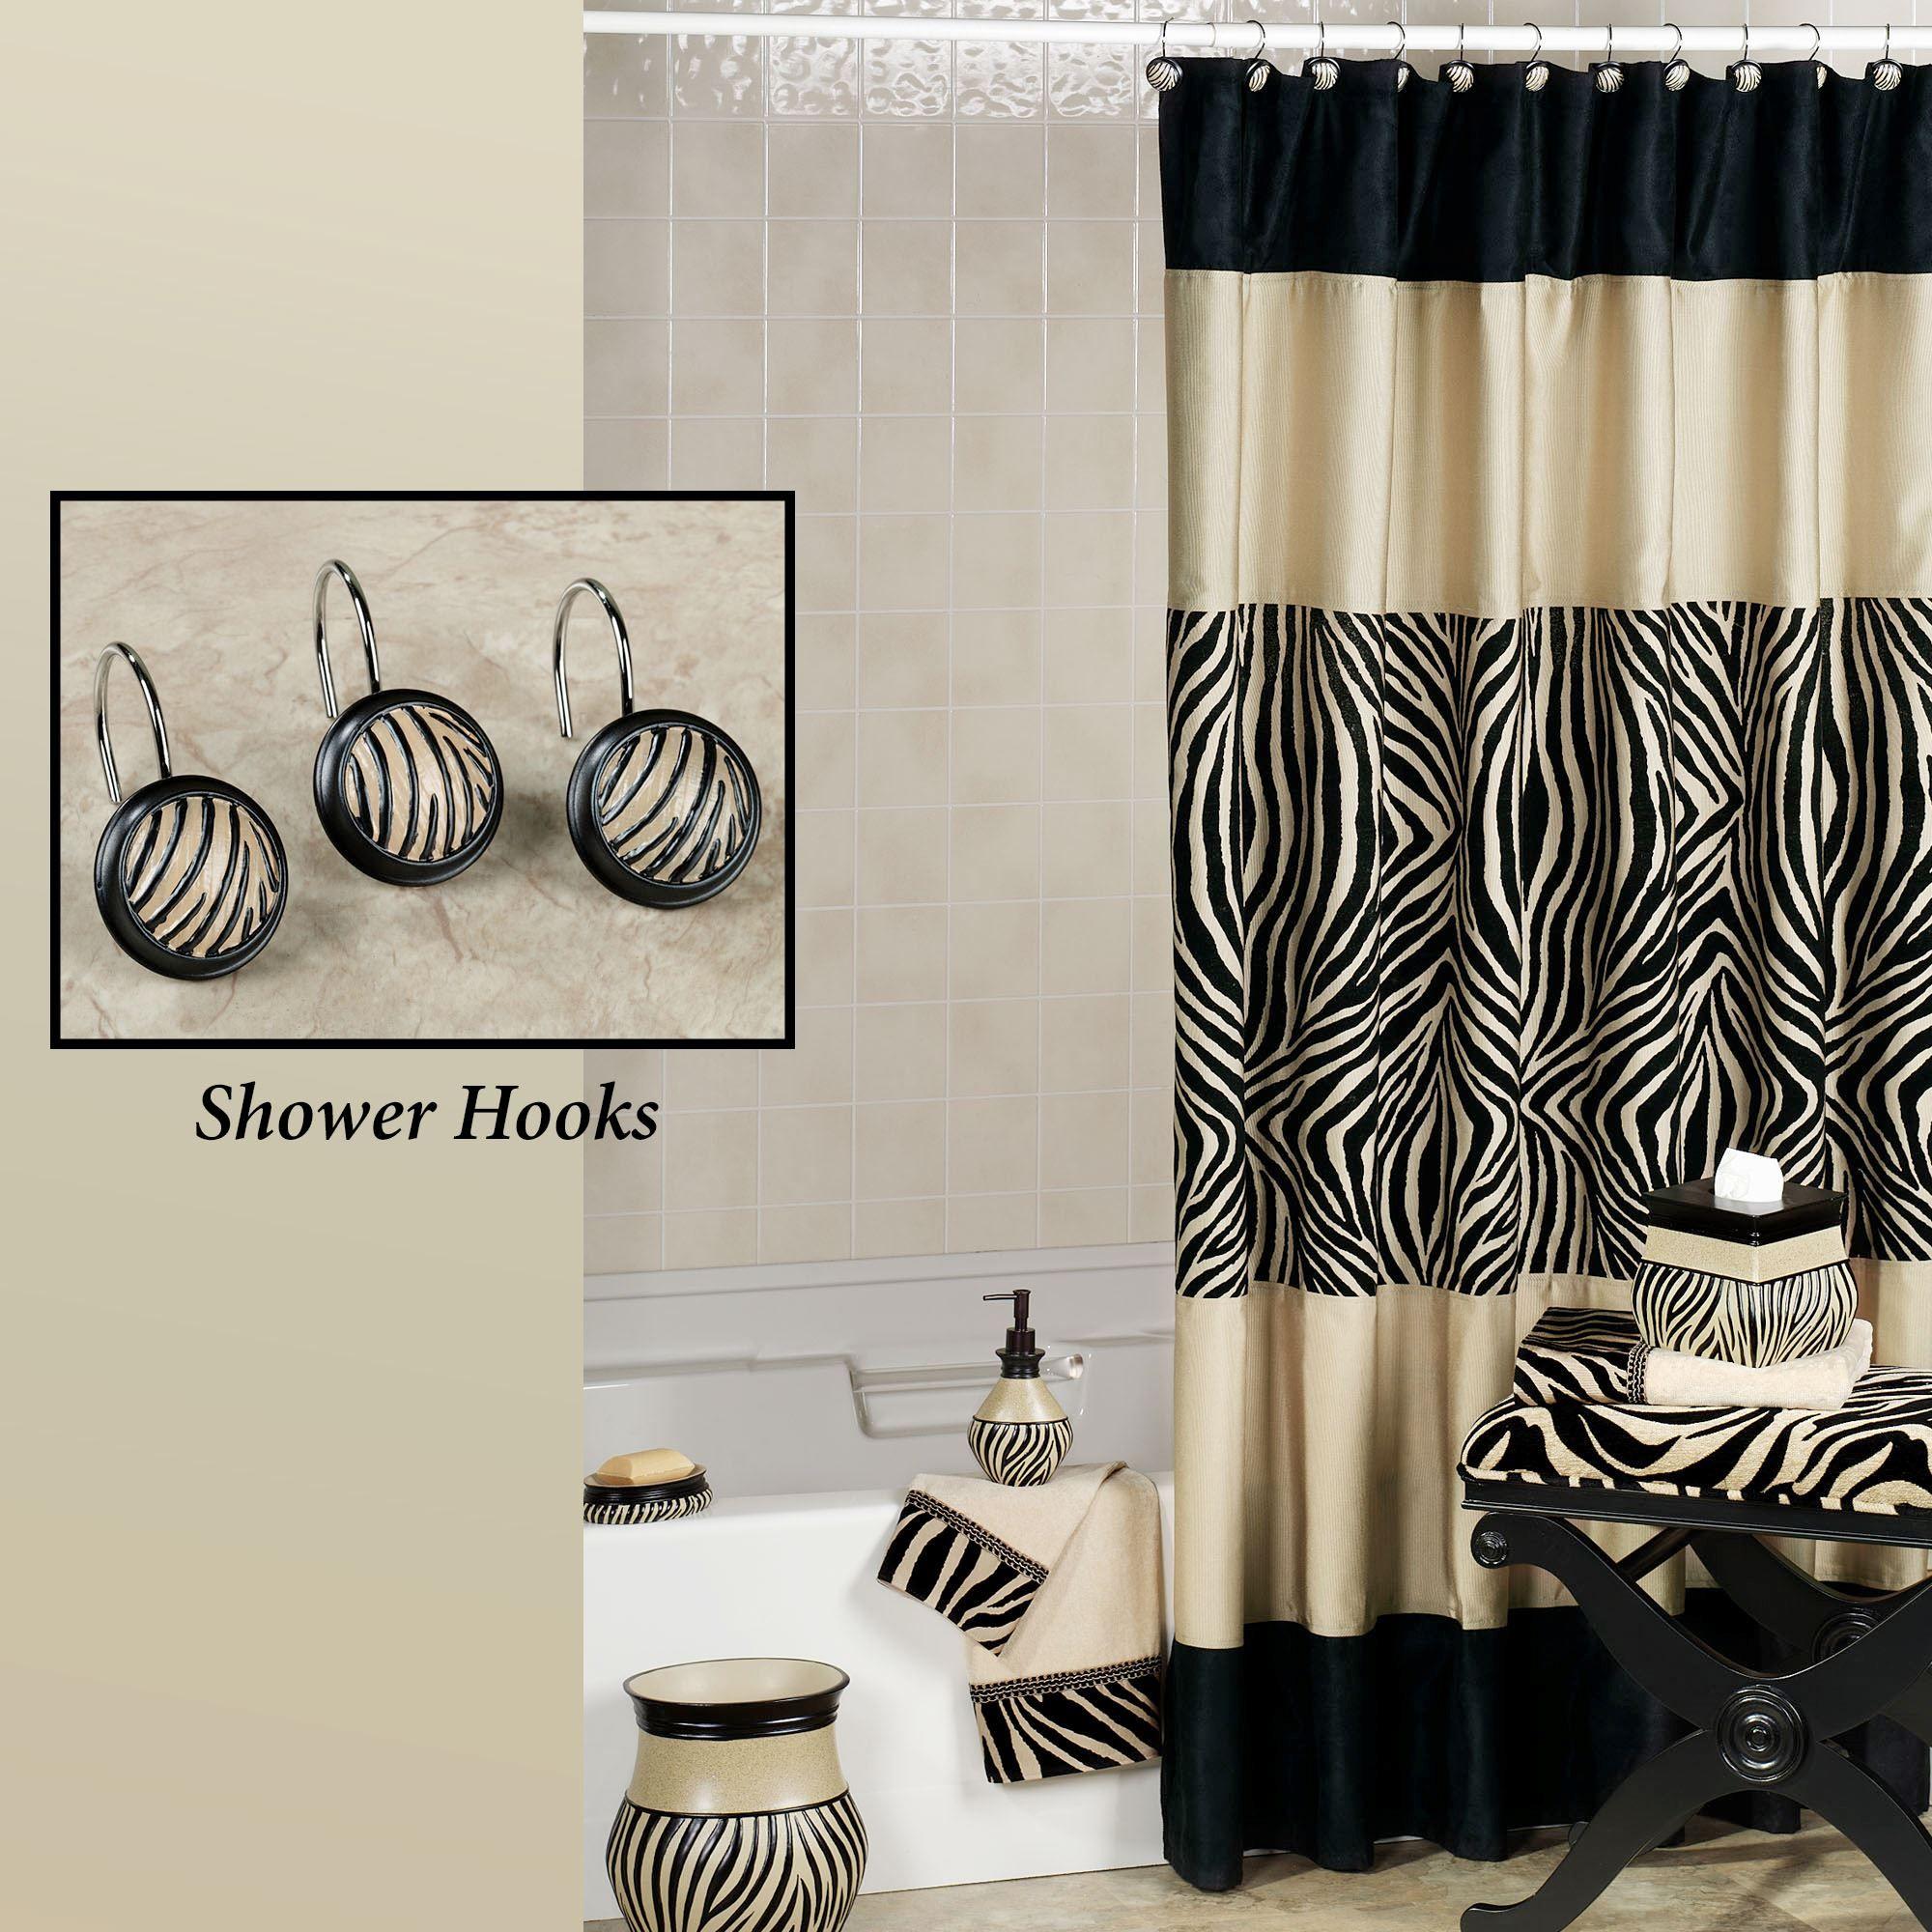 Zuma Zebra Shower Curtain And Hooks